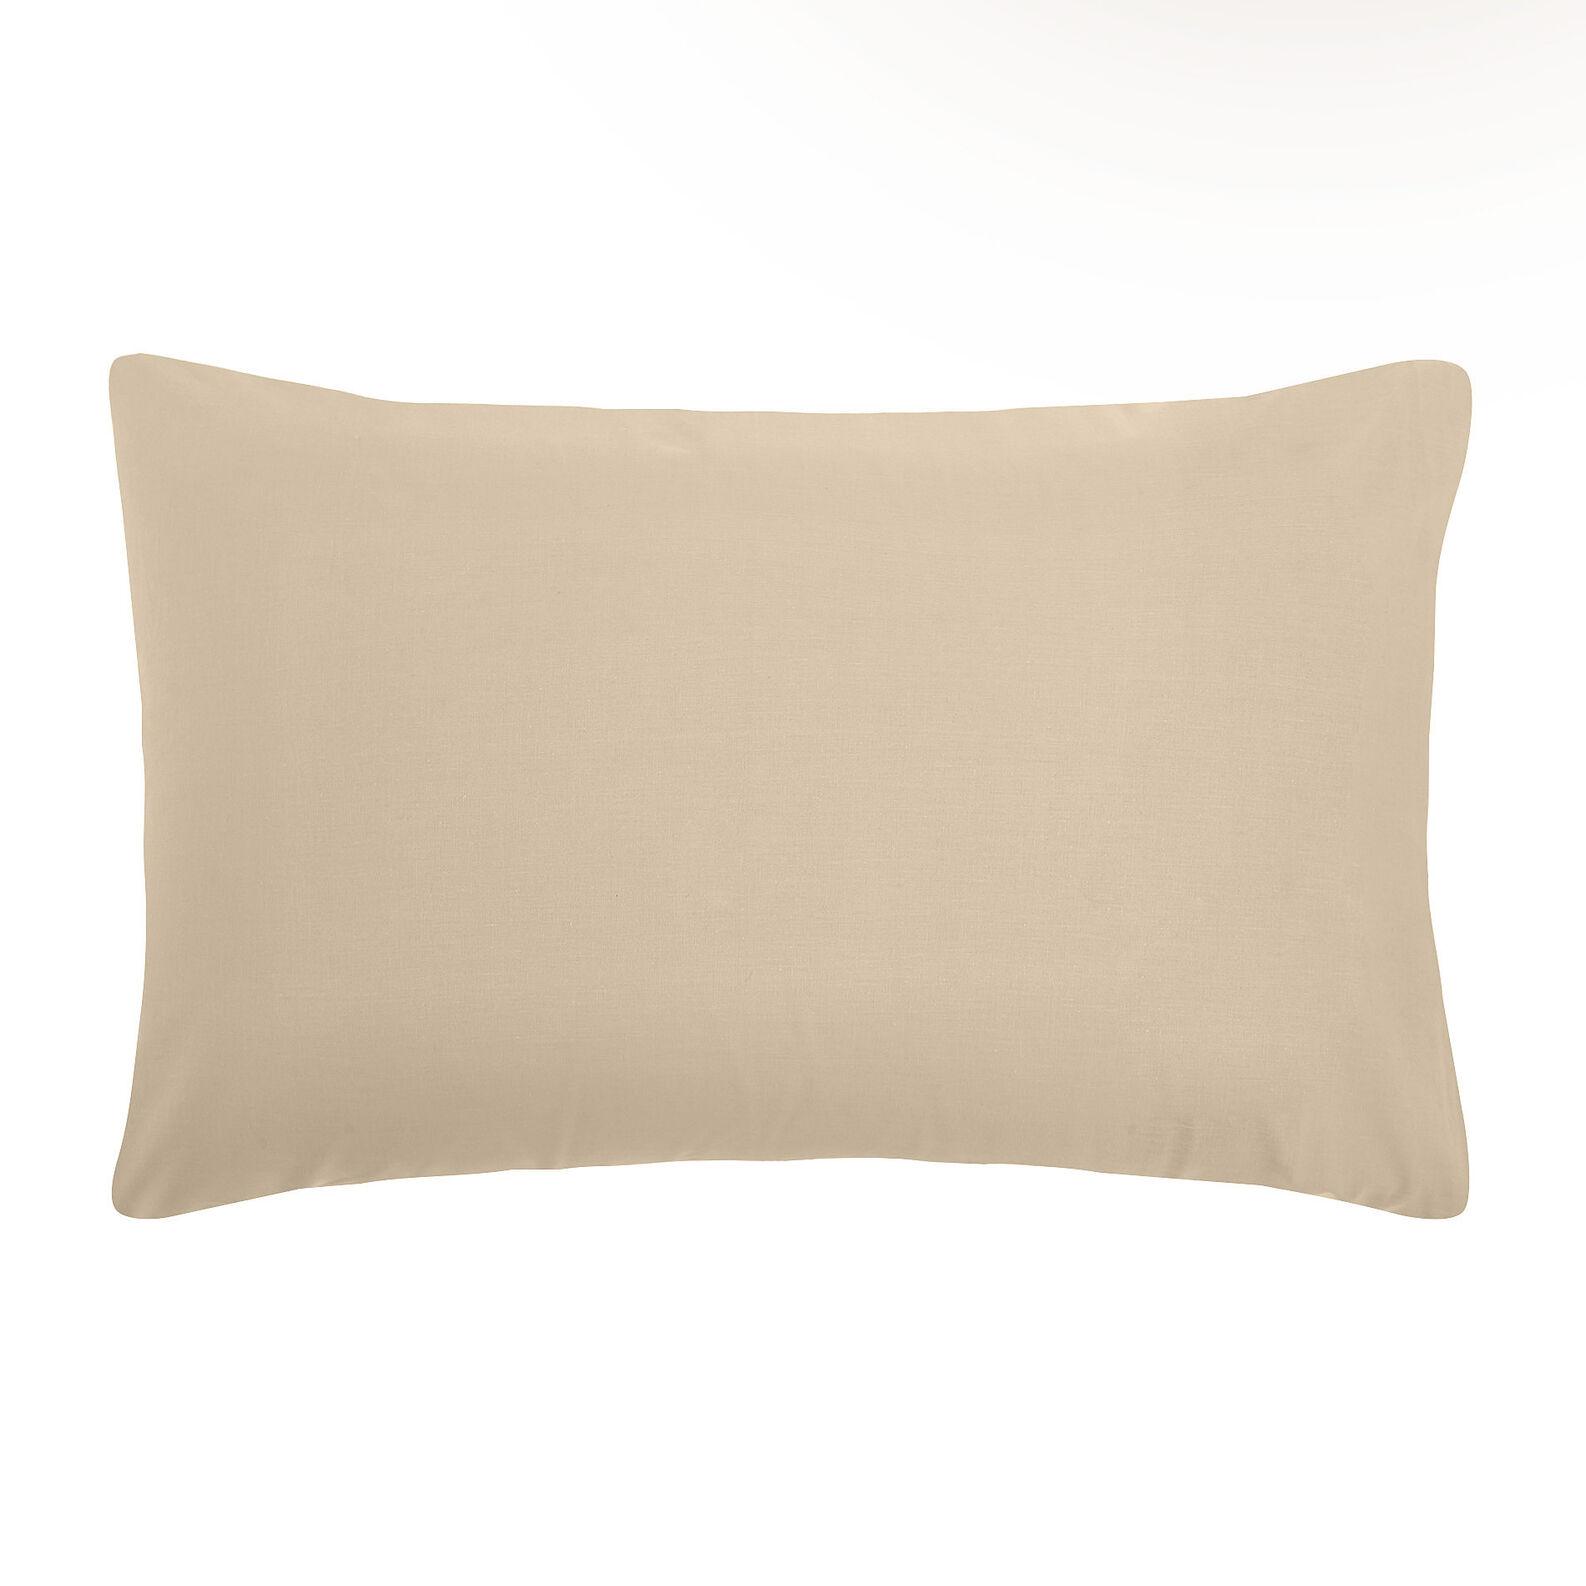 Solid color cotton pillowcase